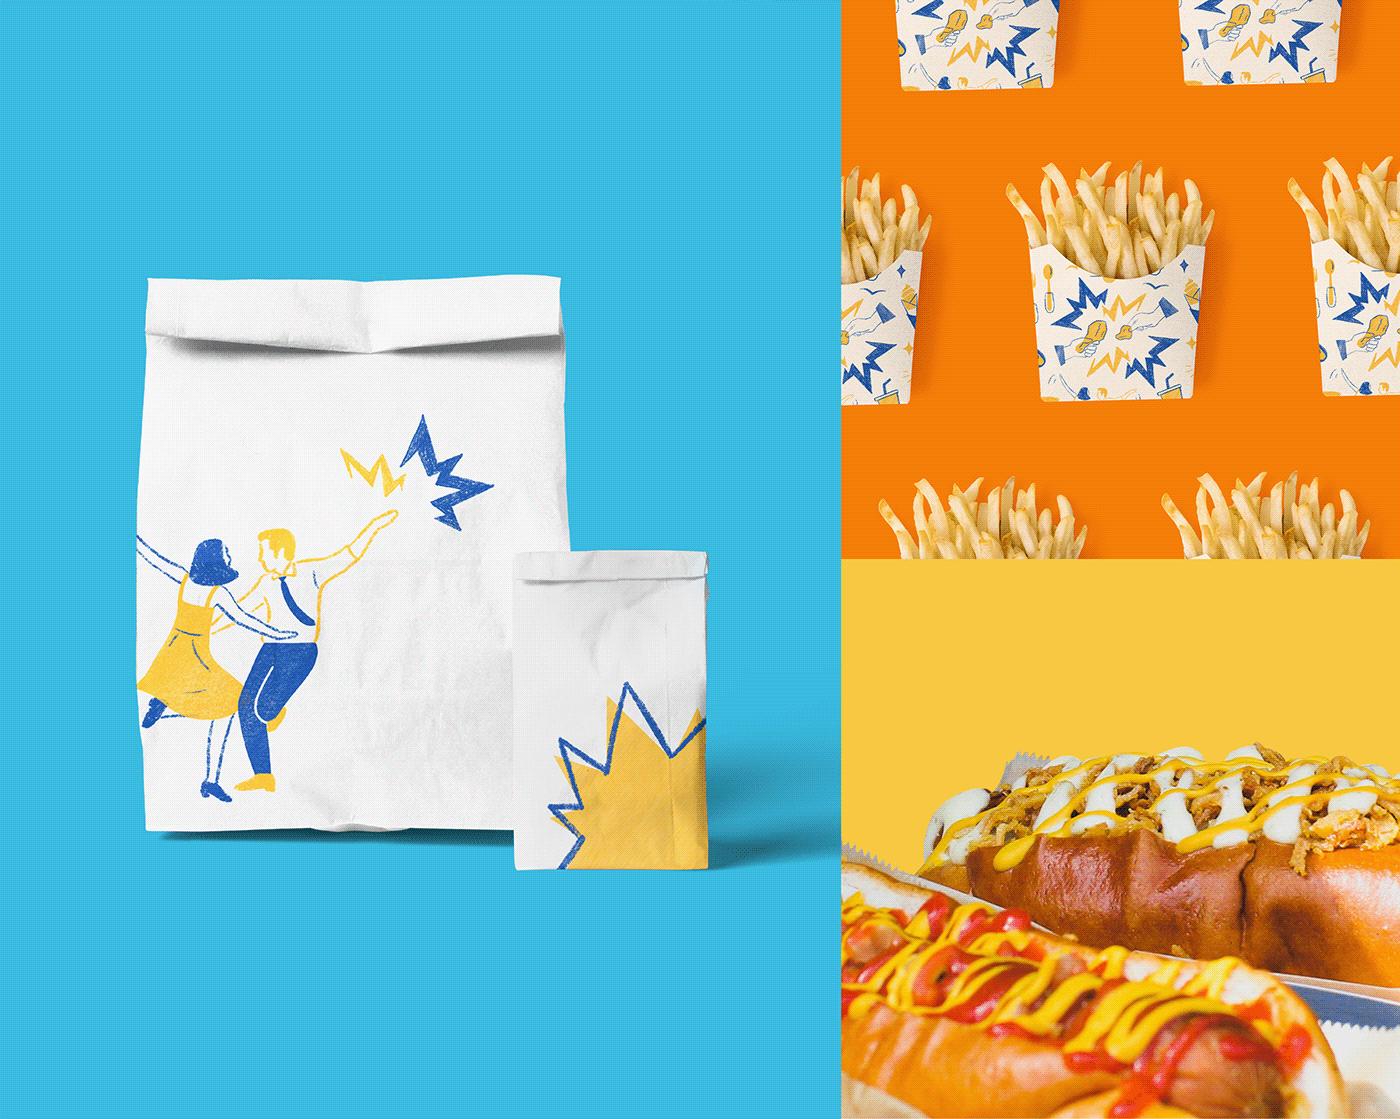 Brand Design brand identity branding  Fast food Food  fried chicken ILLUSTRATION  Packaging restaurant visual identity